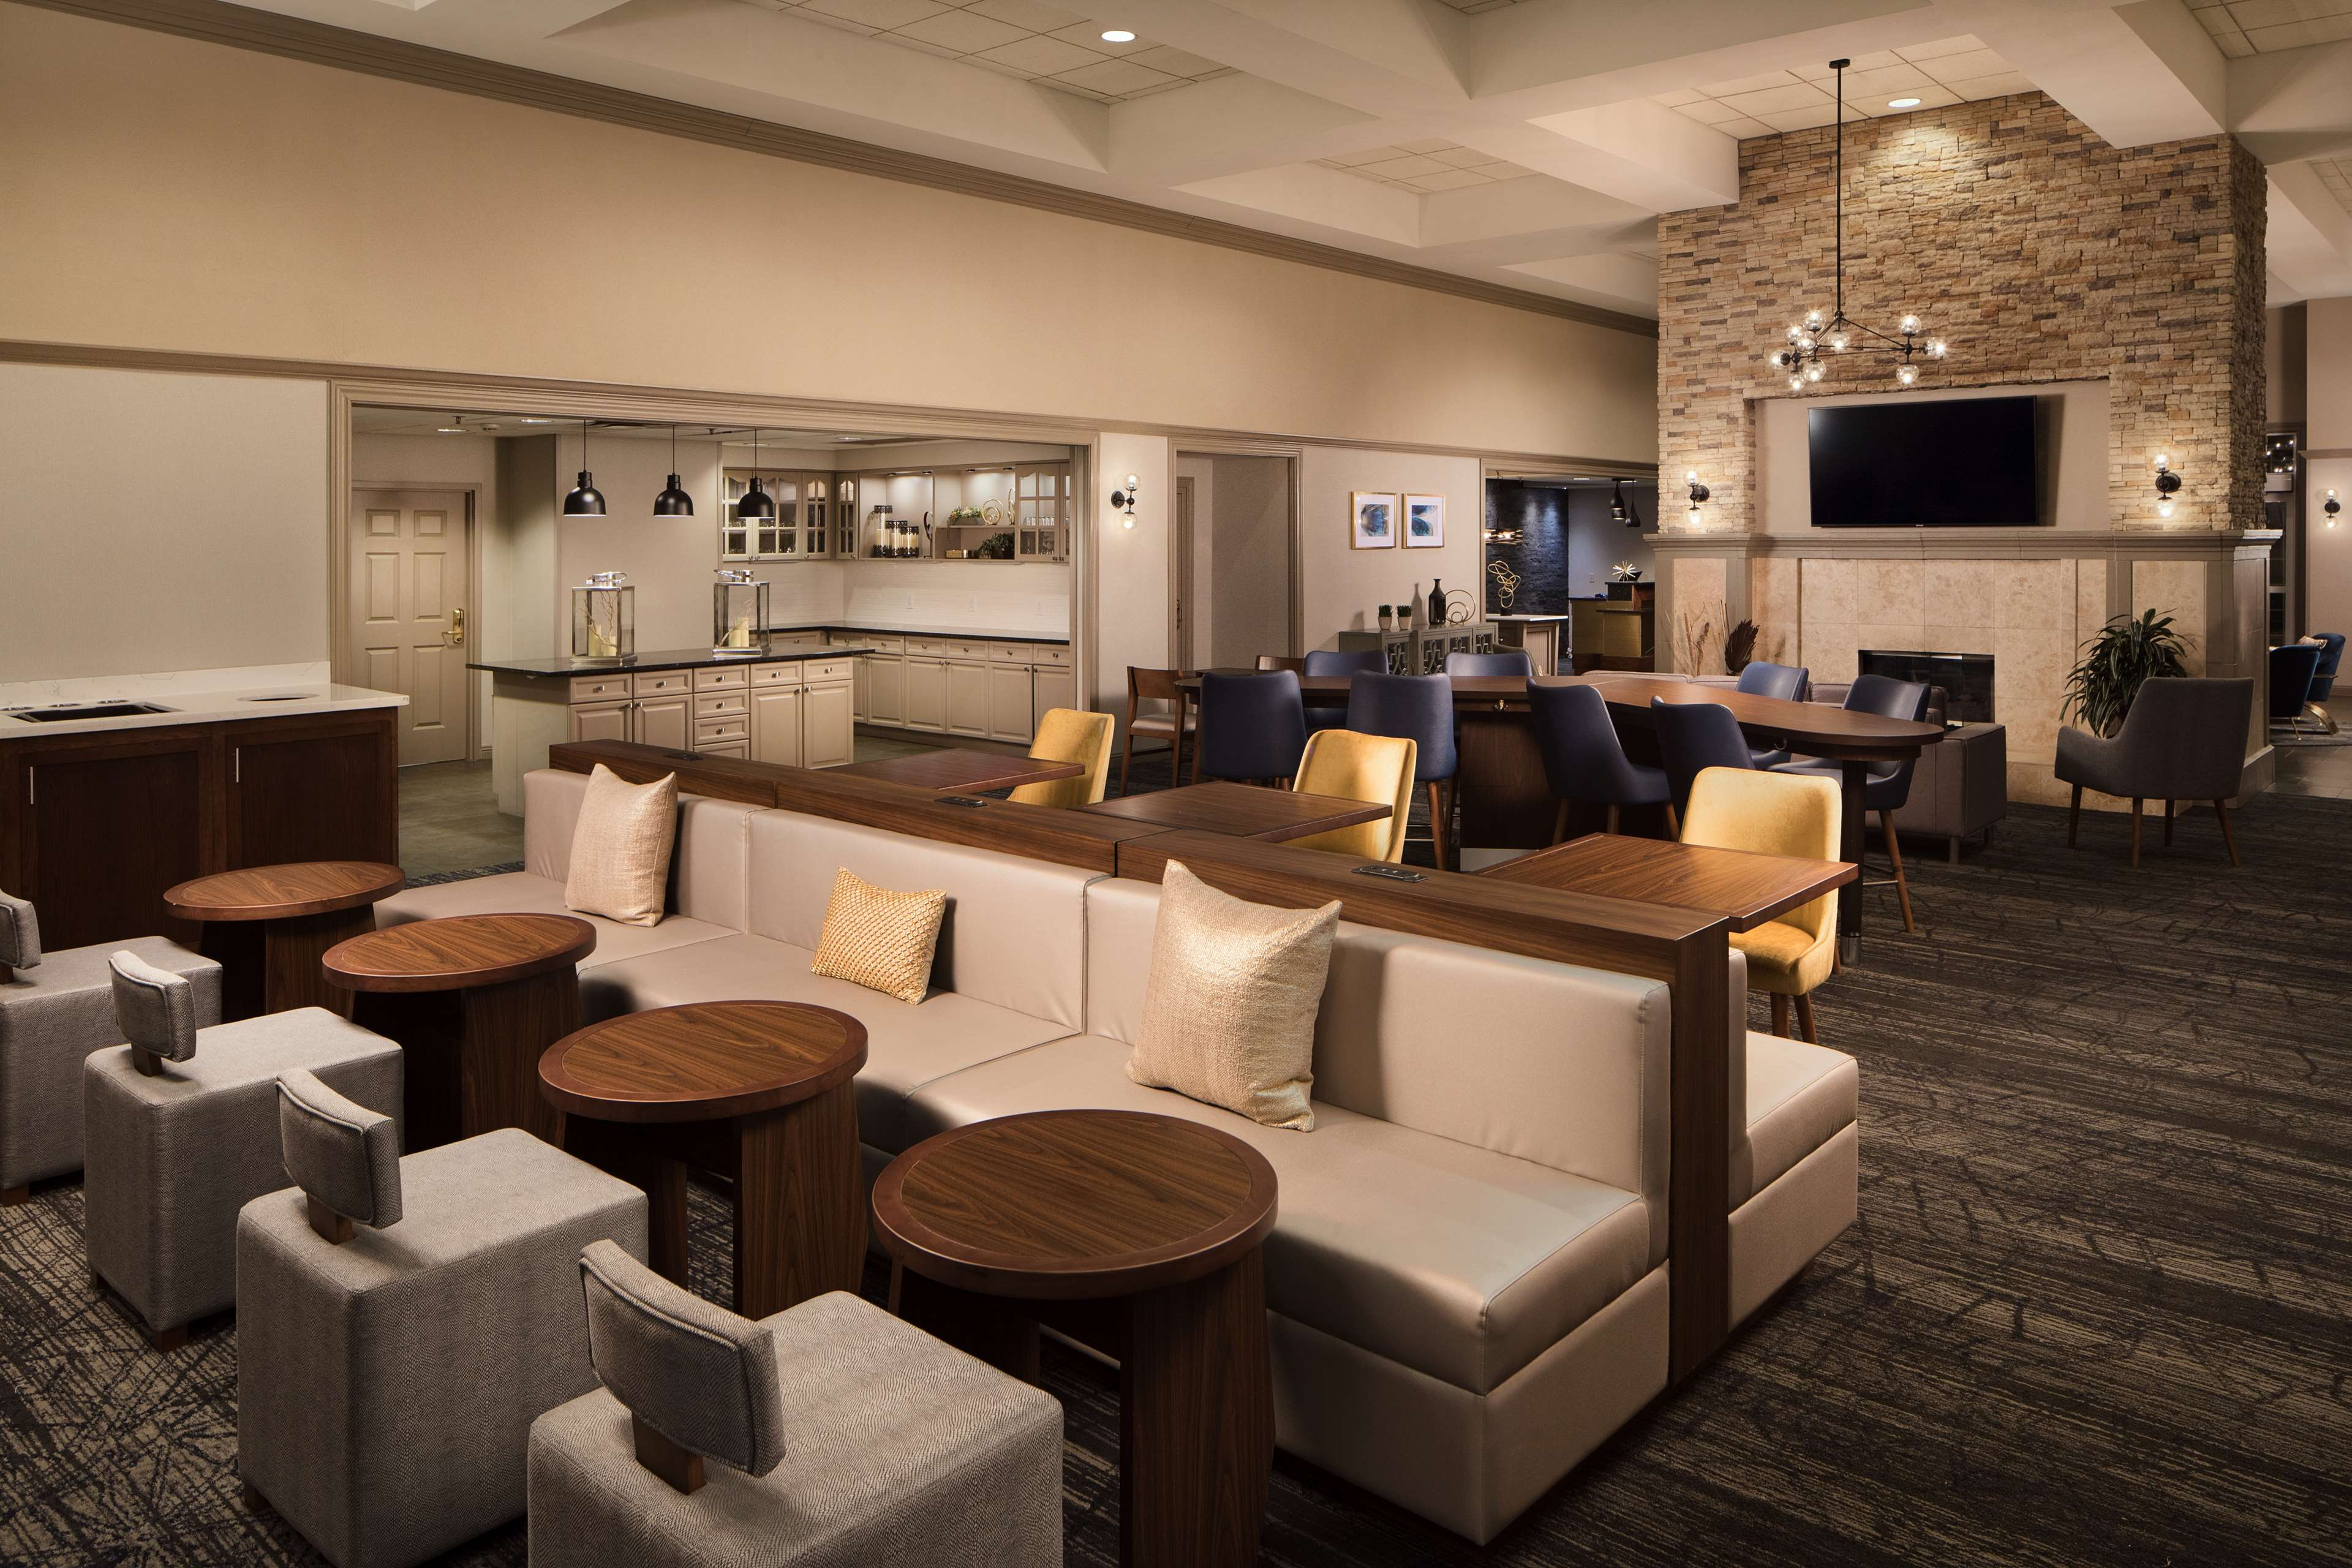 Homewood Suites by Hilton Lubbock image 4